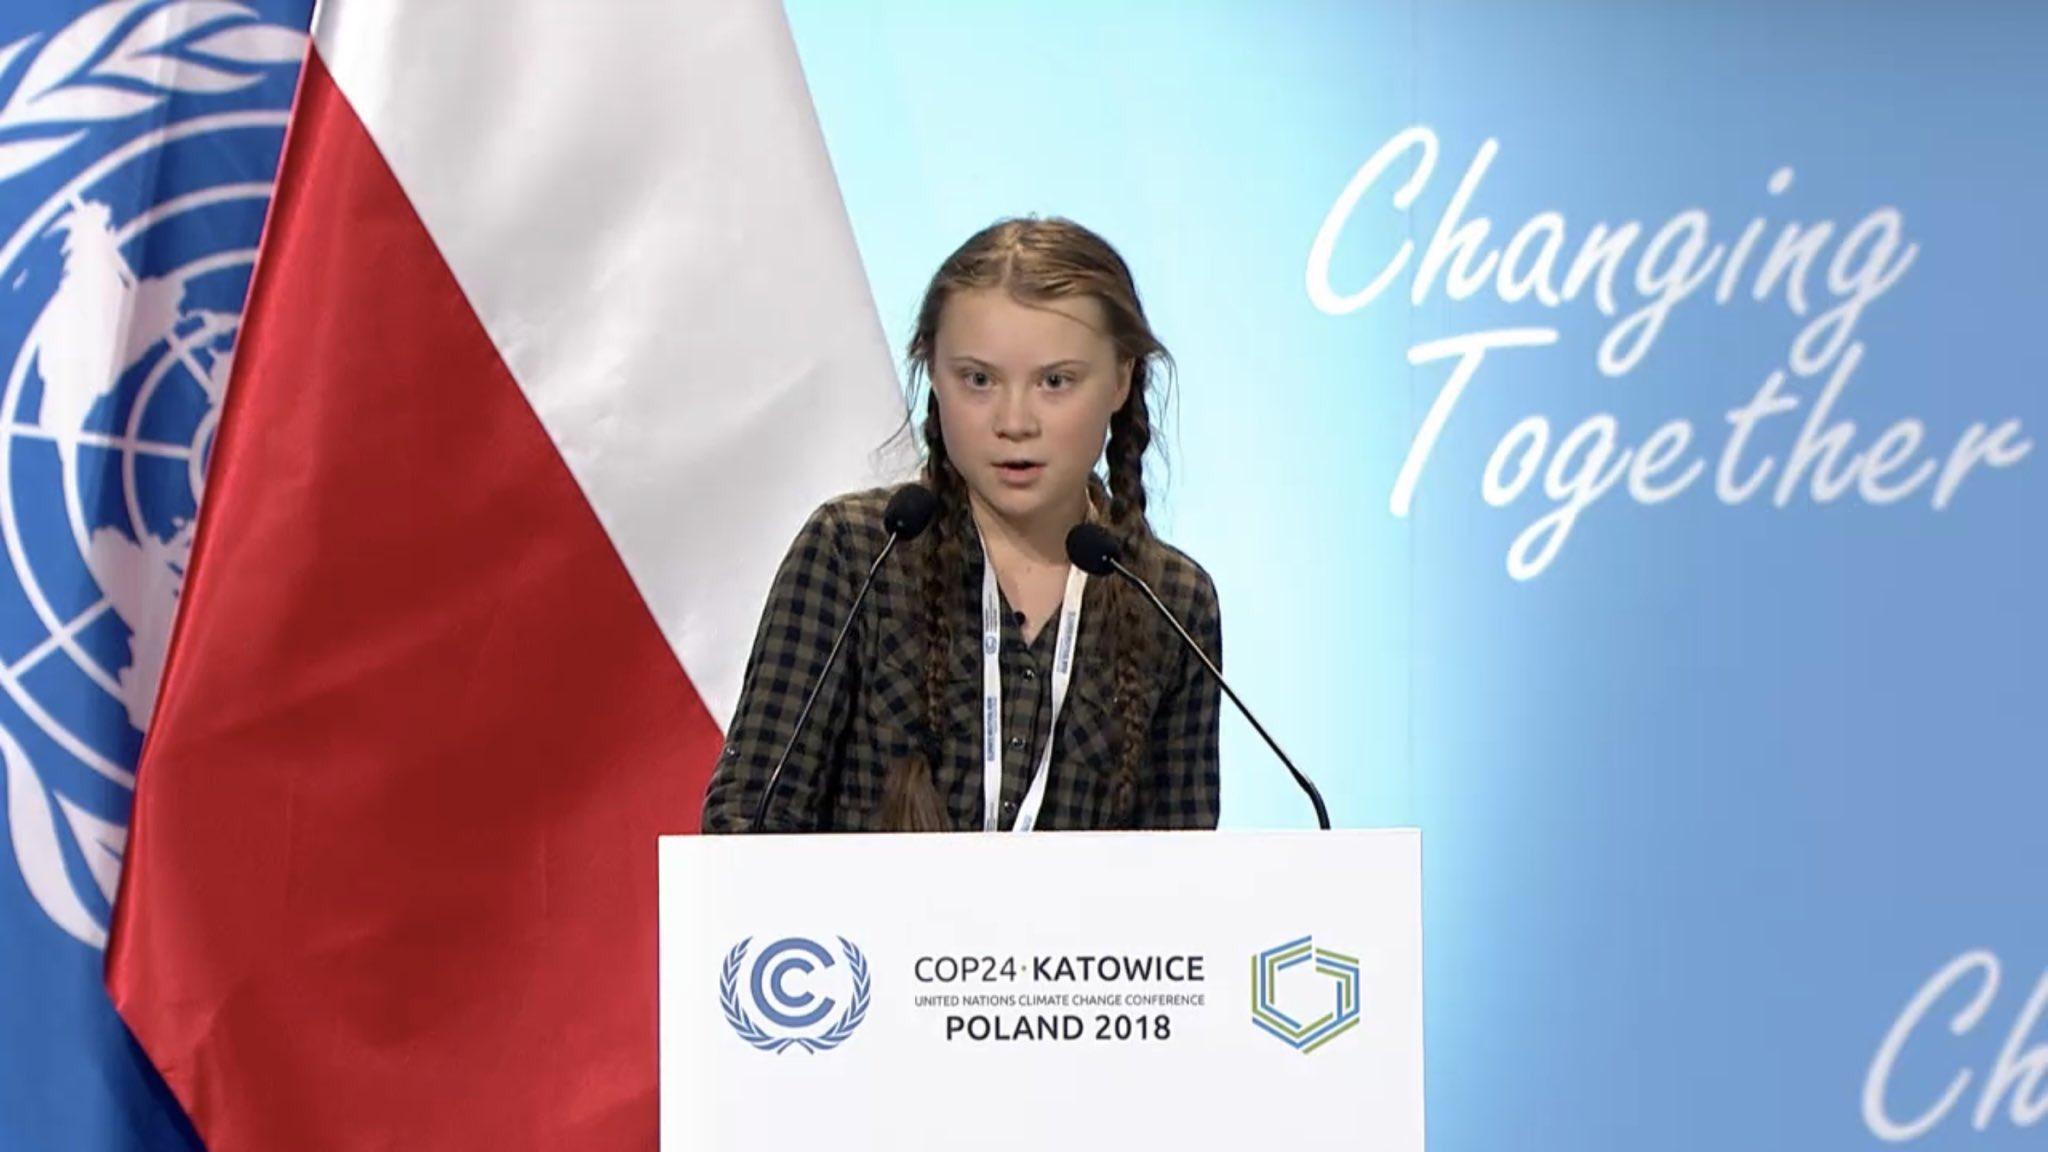 Greta Thungerg, Twitter https://twitter.com/GretaThunberg/status/1073527918616297472